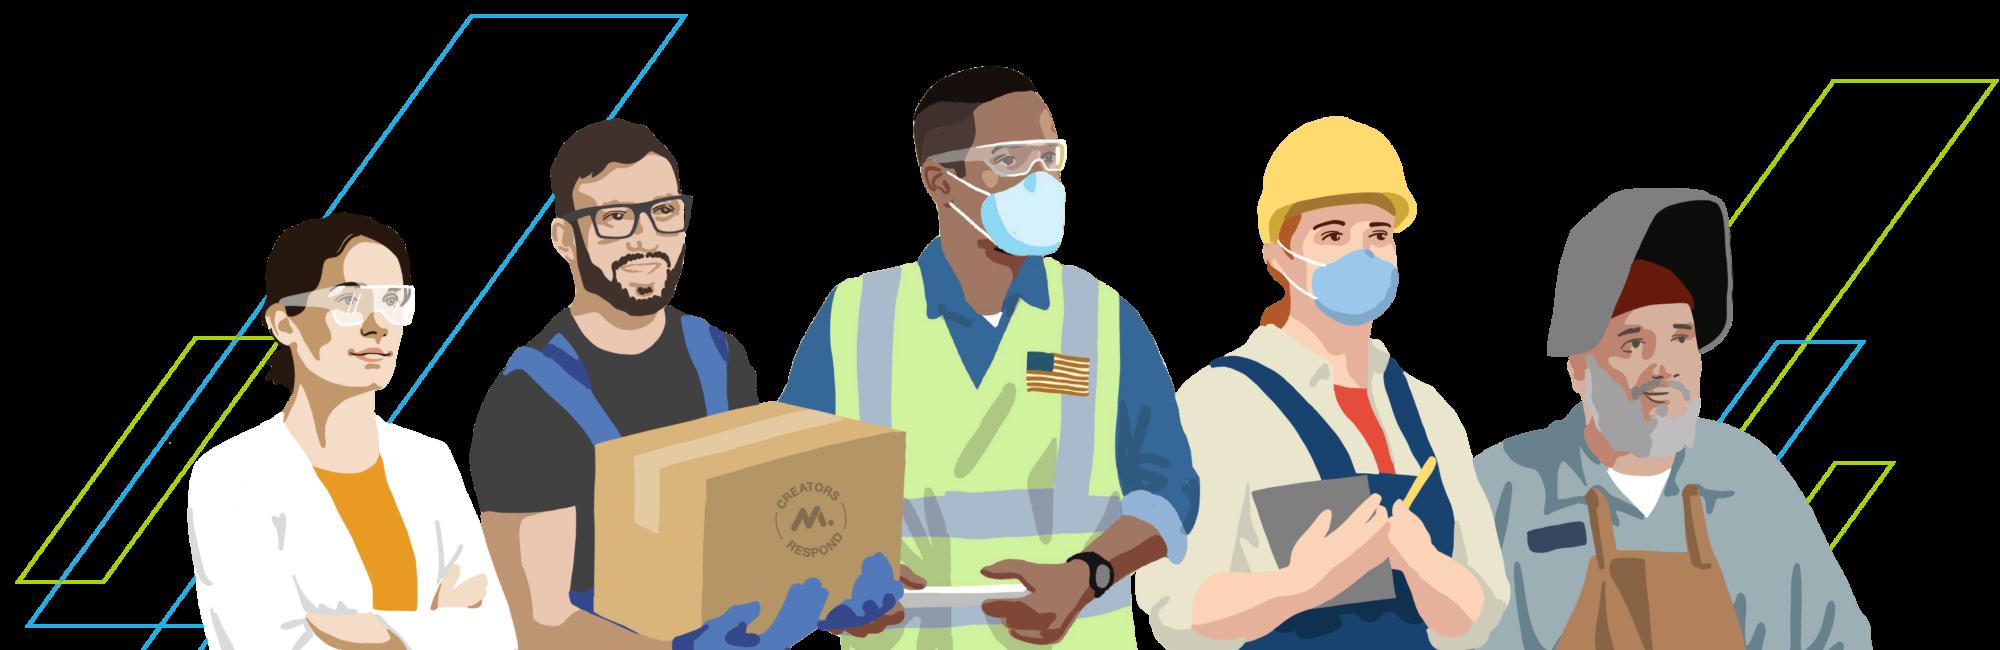 Illustration of manufacturers